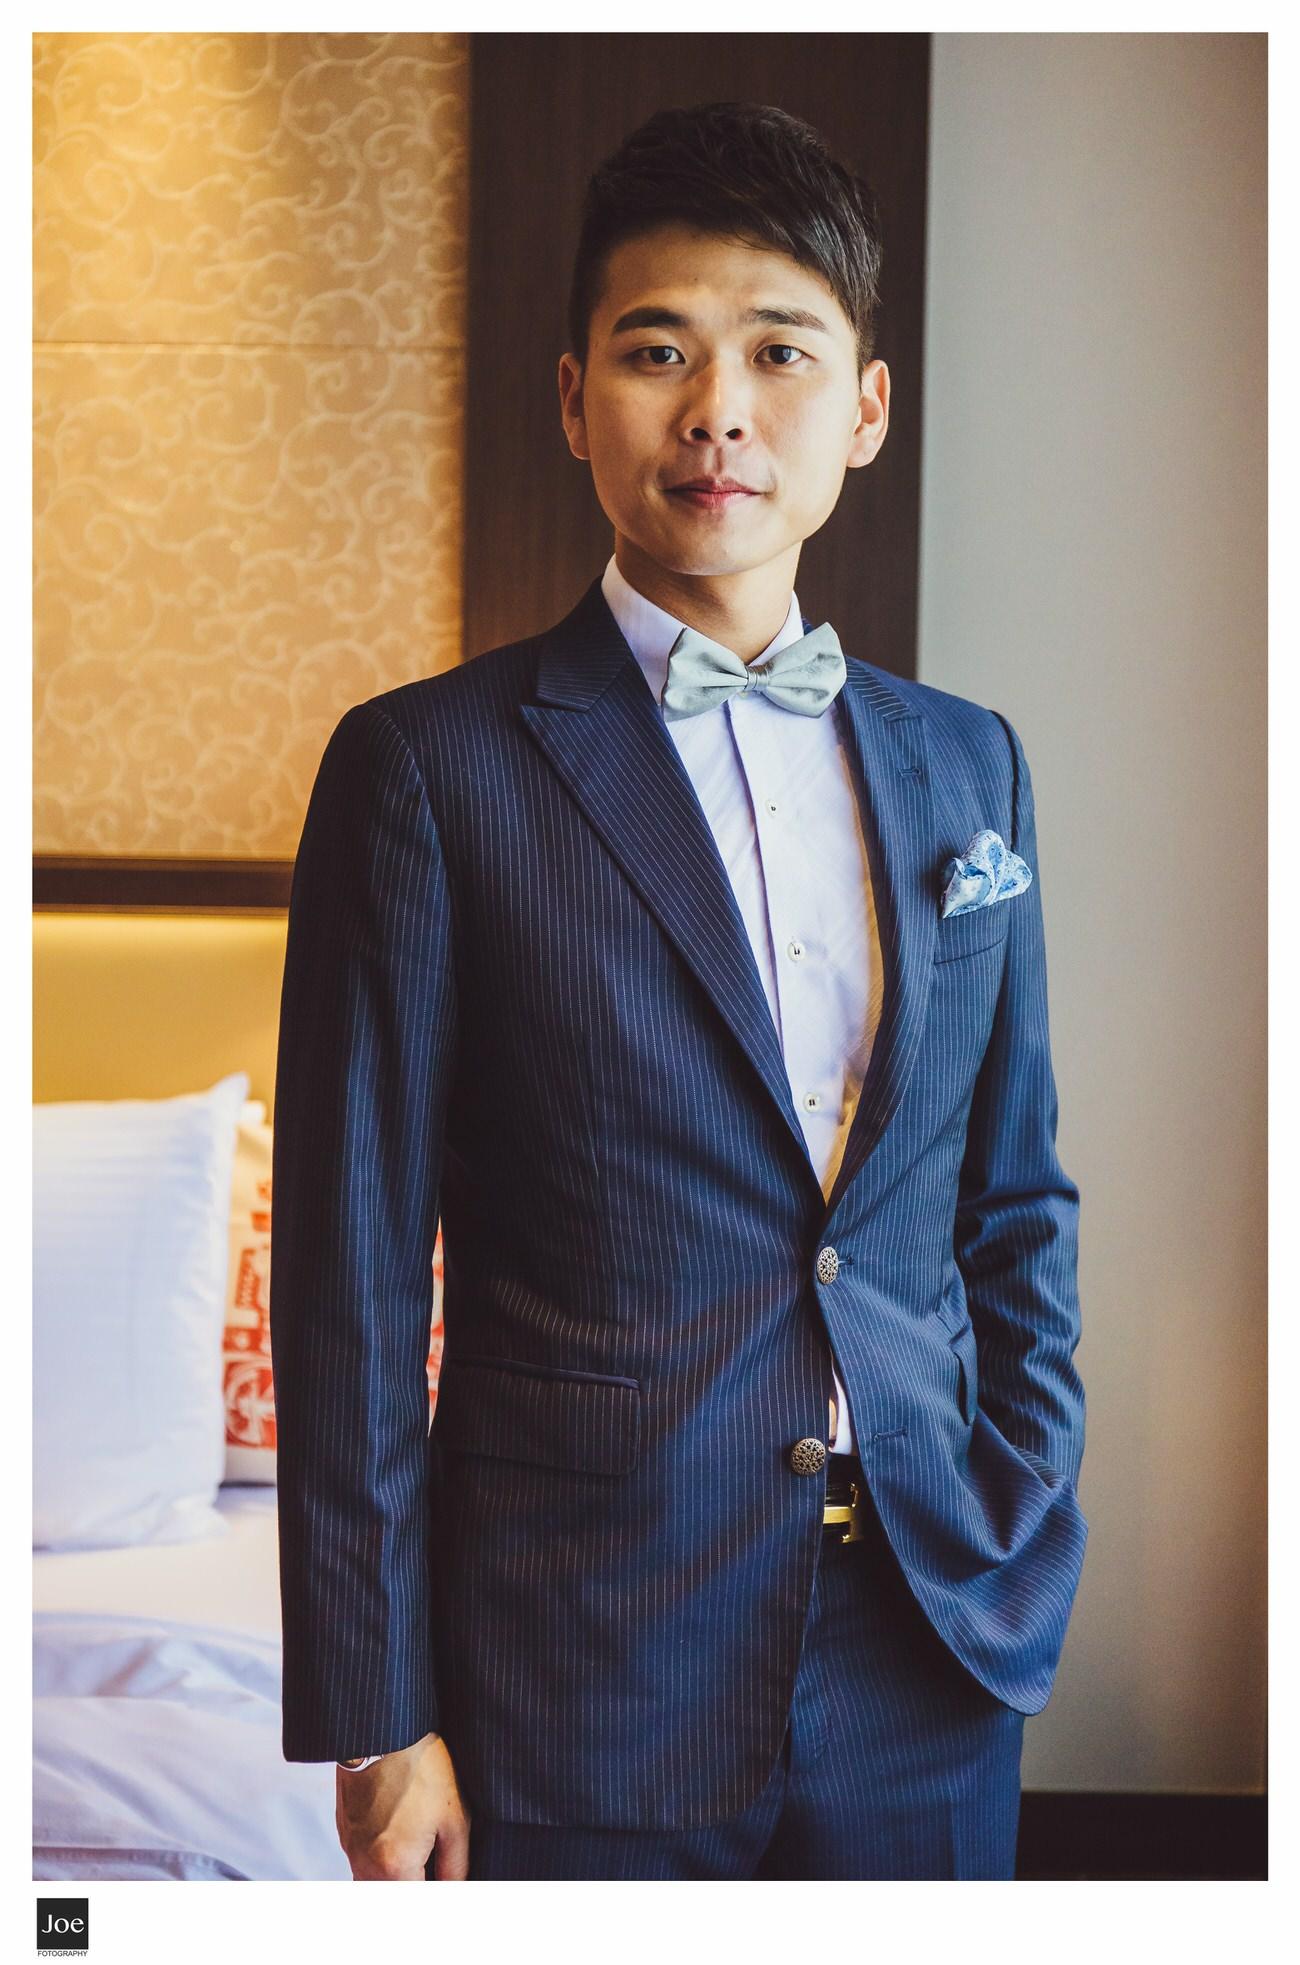 sunworld-dynasty-hotel-taipei-wedding-photo-joe-fotography-angel-jay-026.jpg